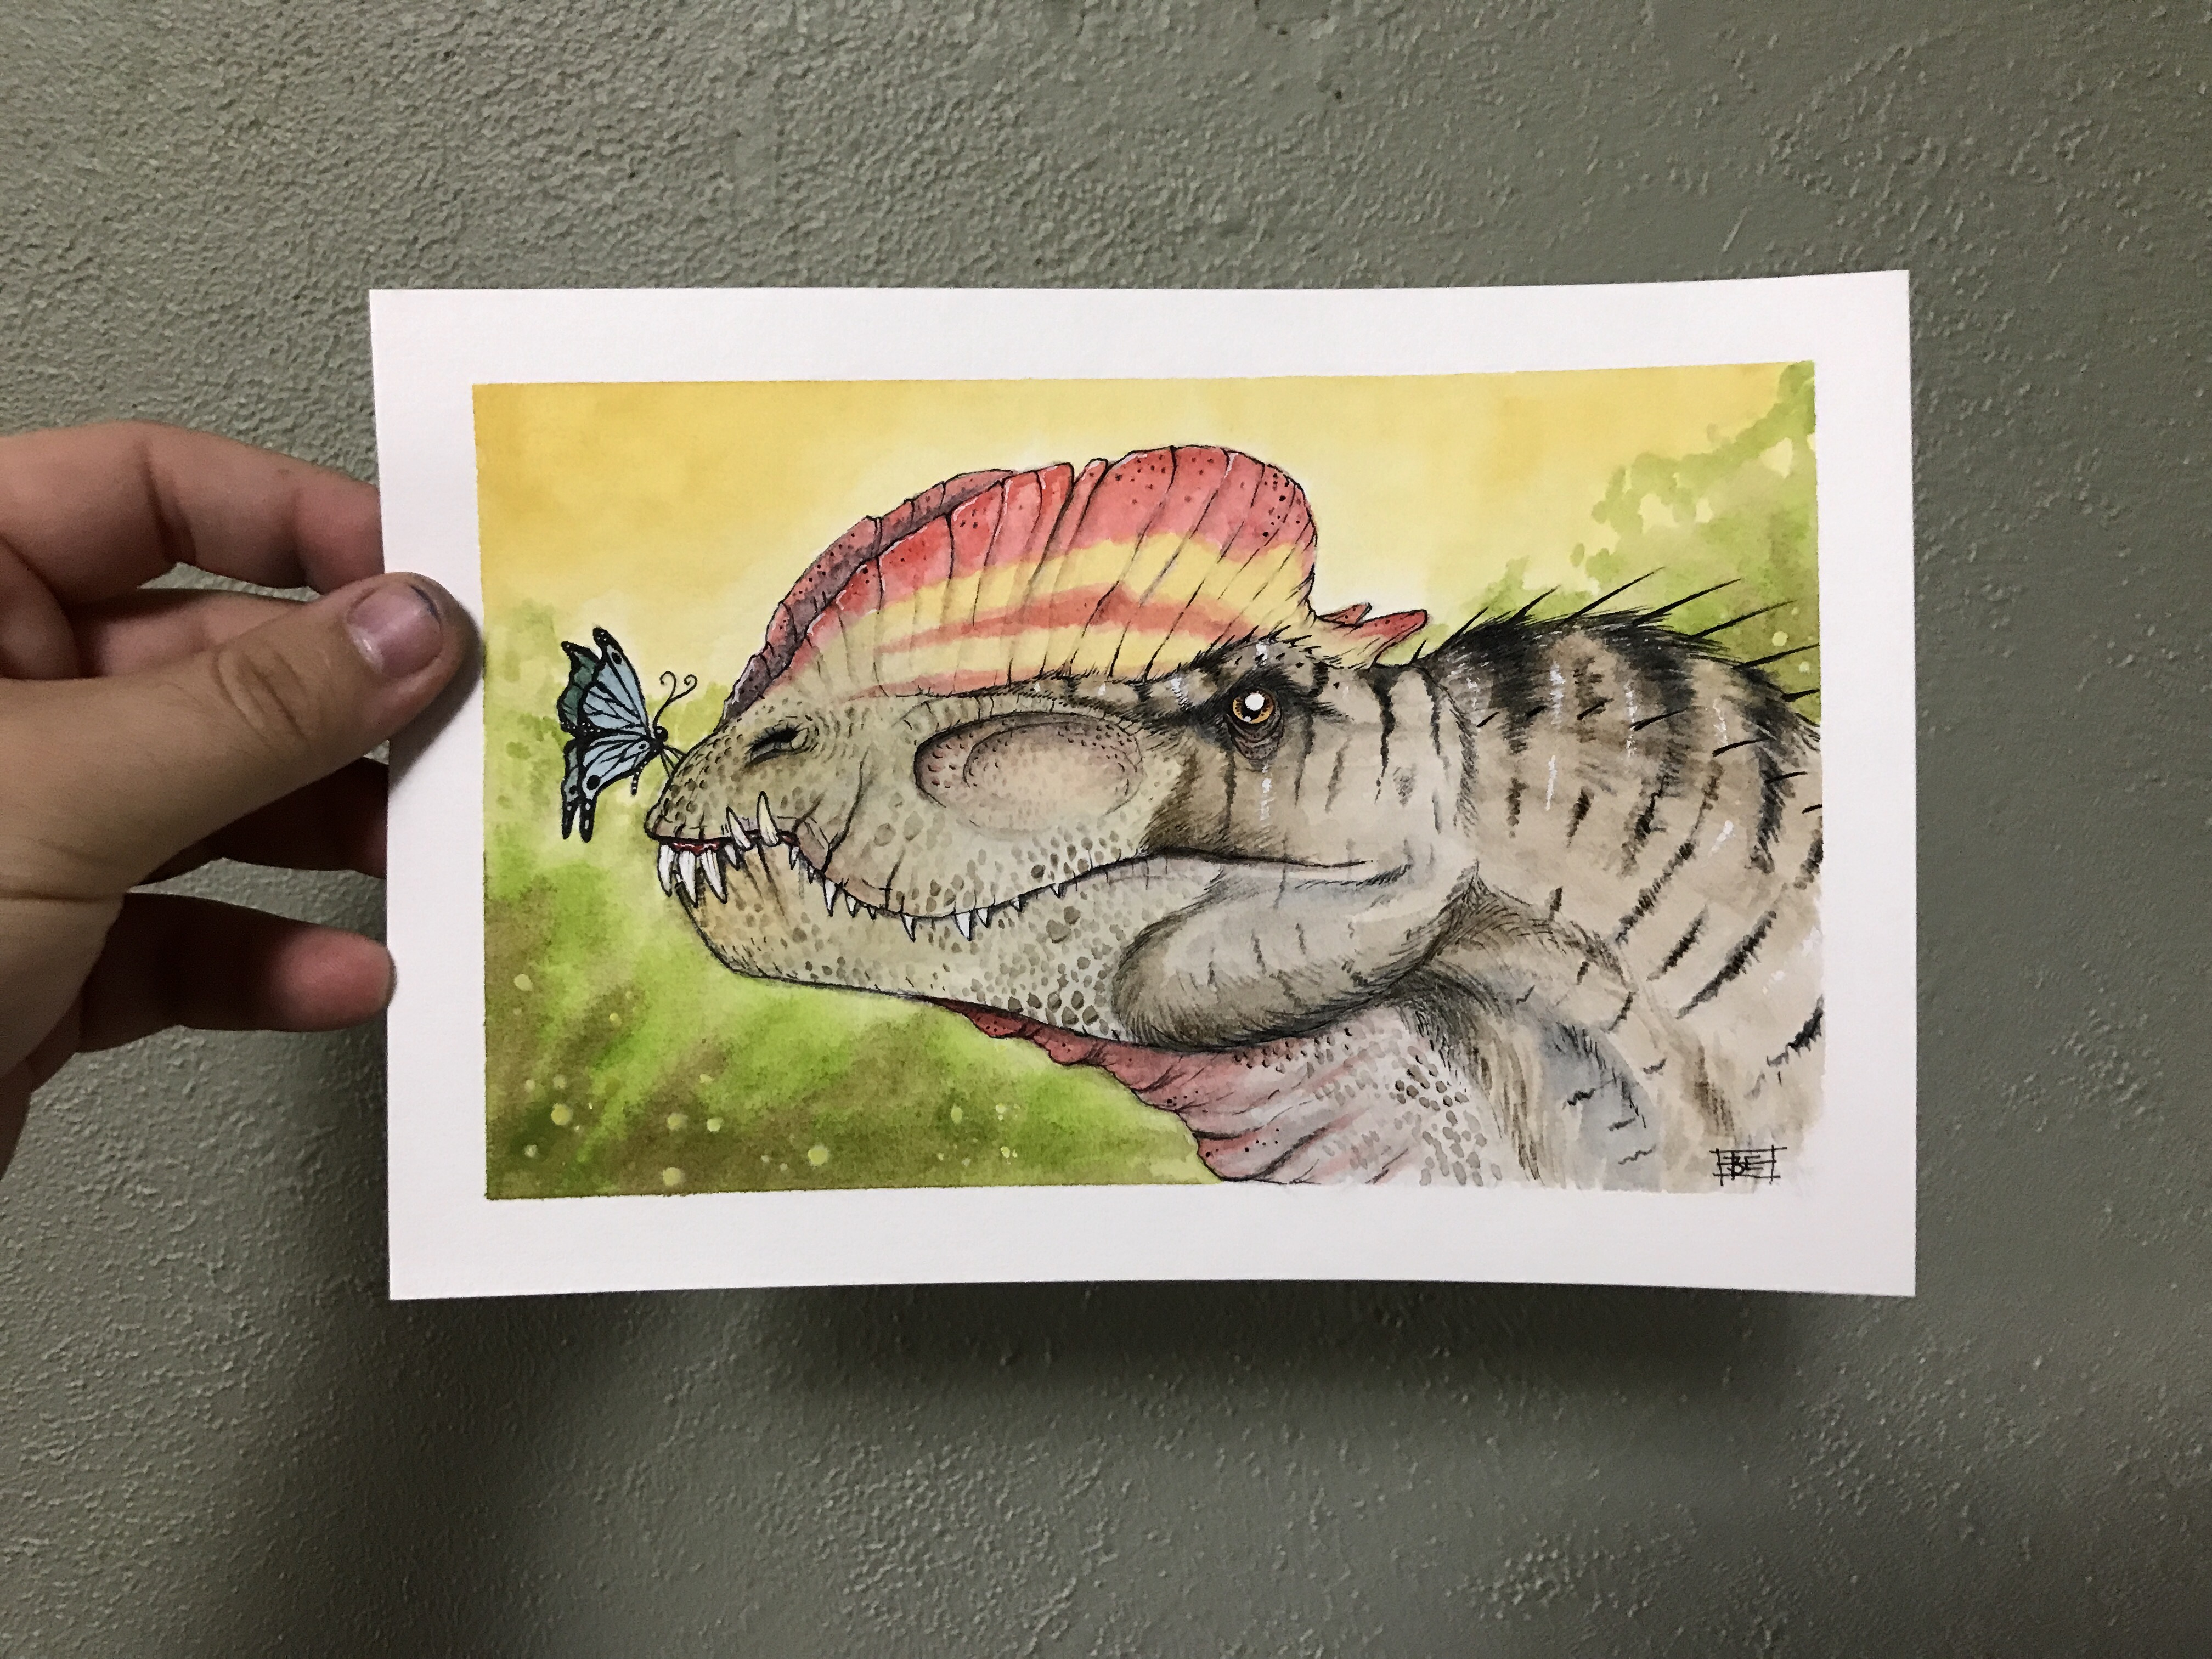 Dilphosaurus